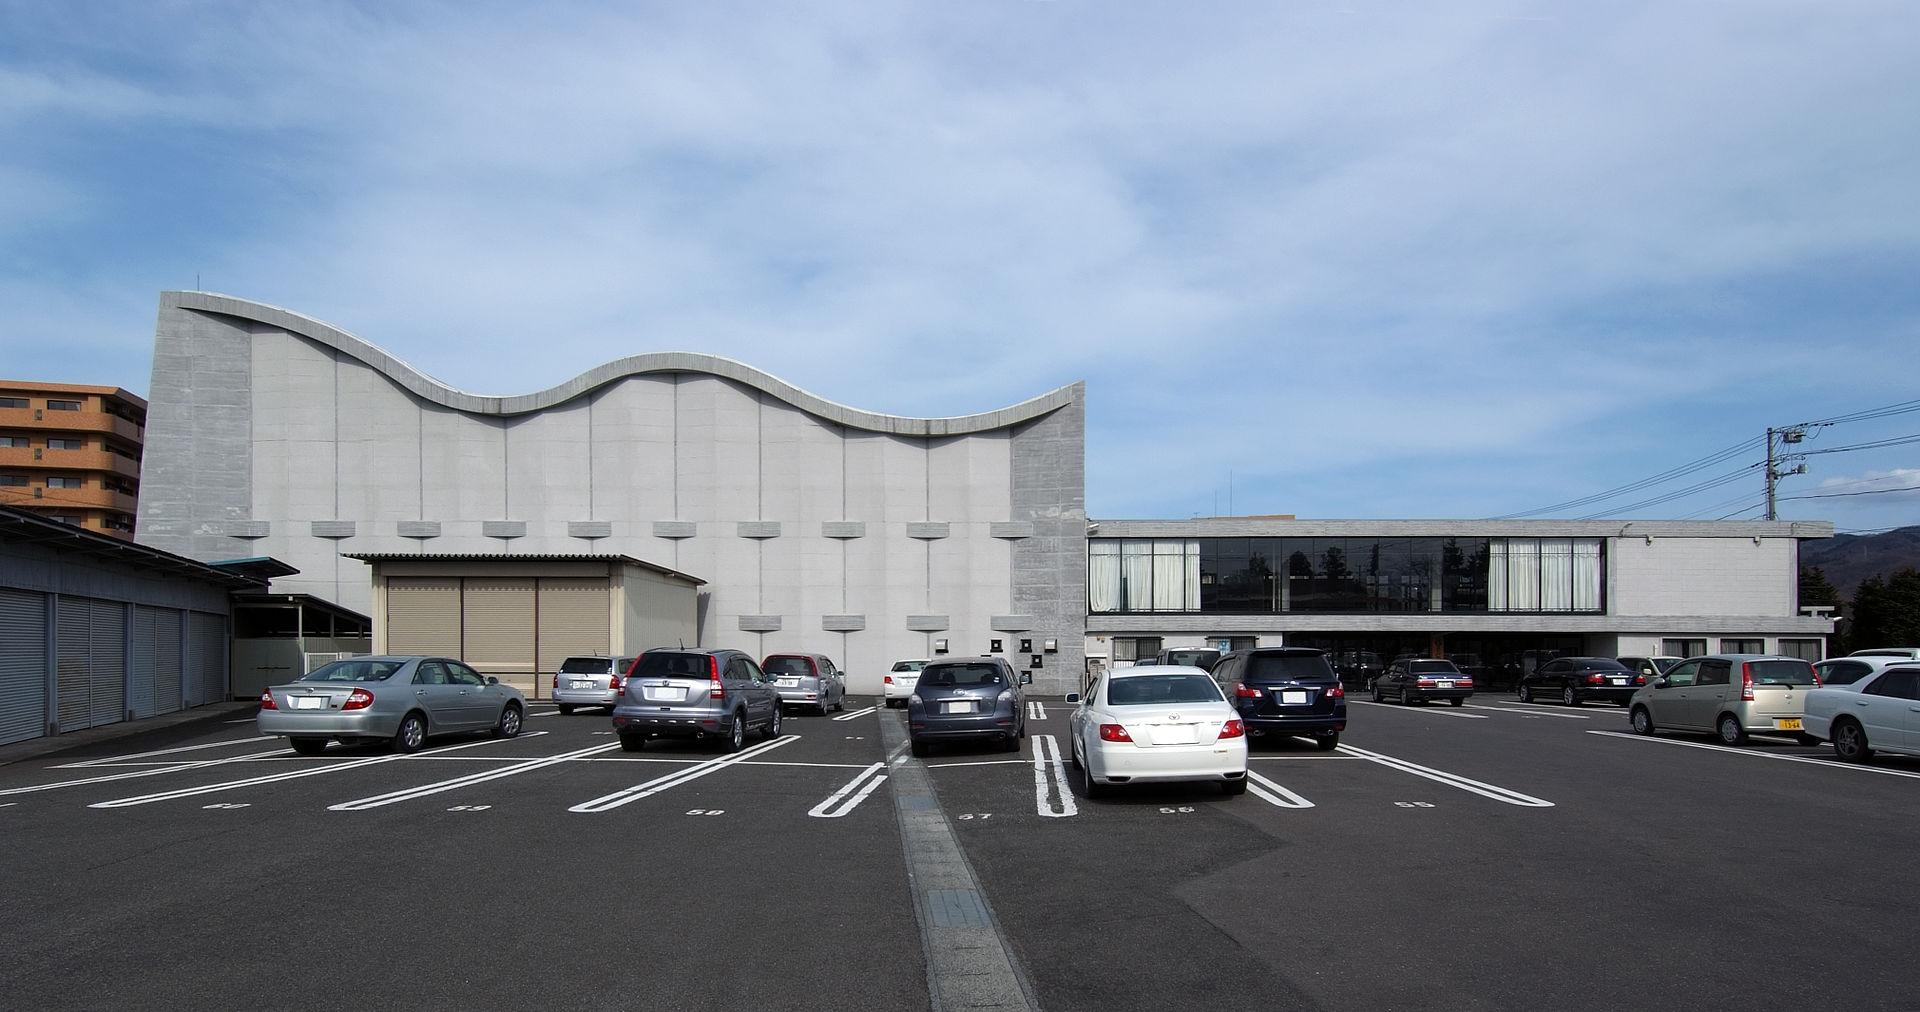 Education Center in Fukushima by Kunio Maekawa